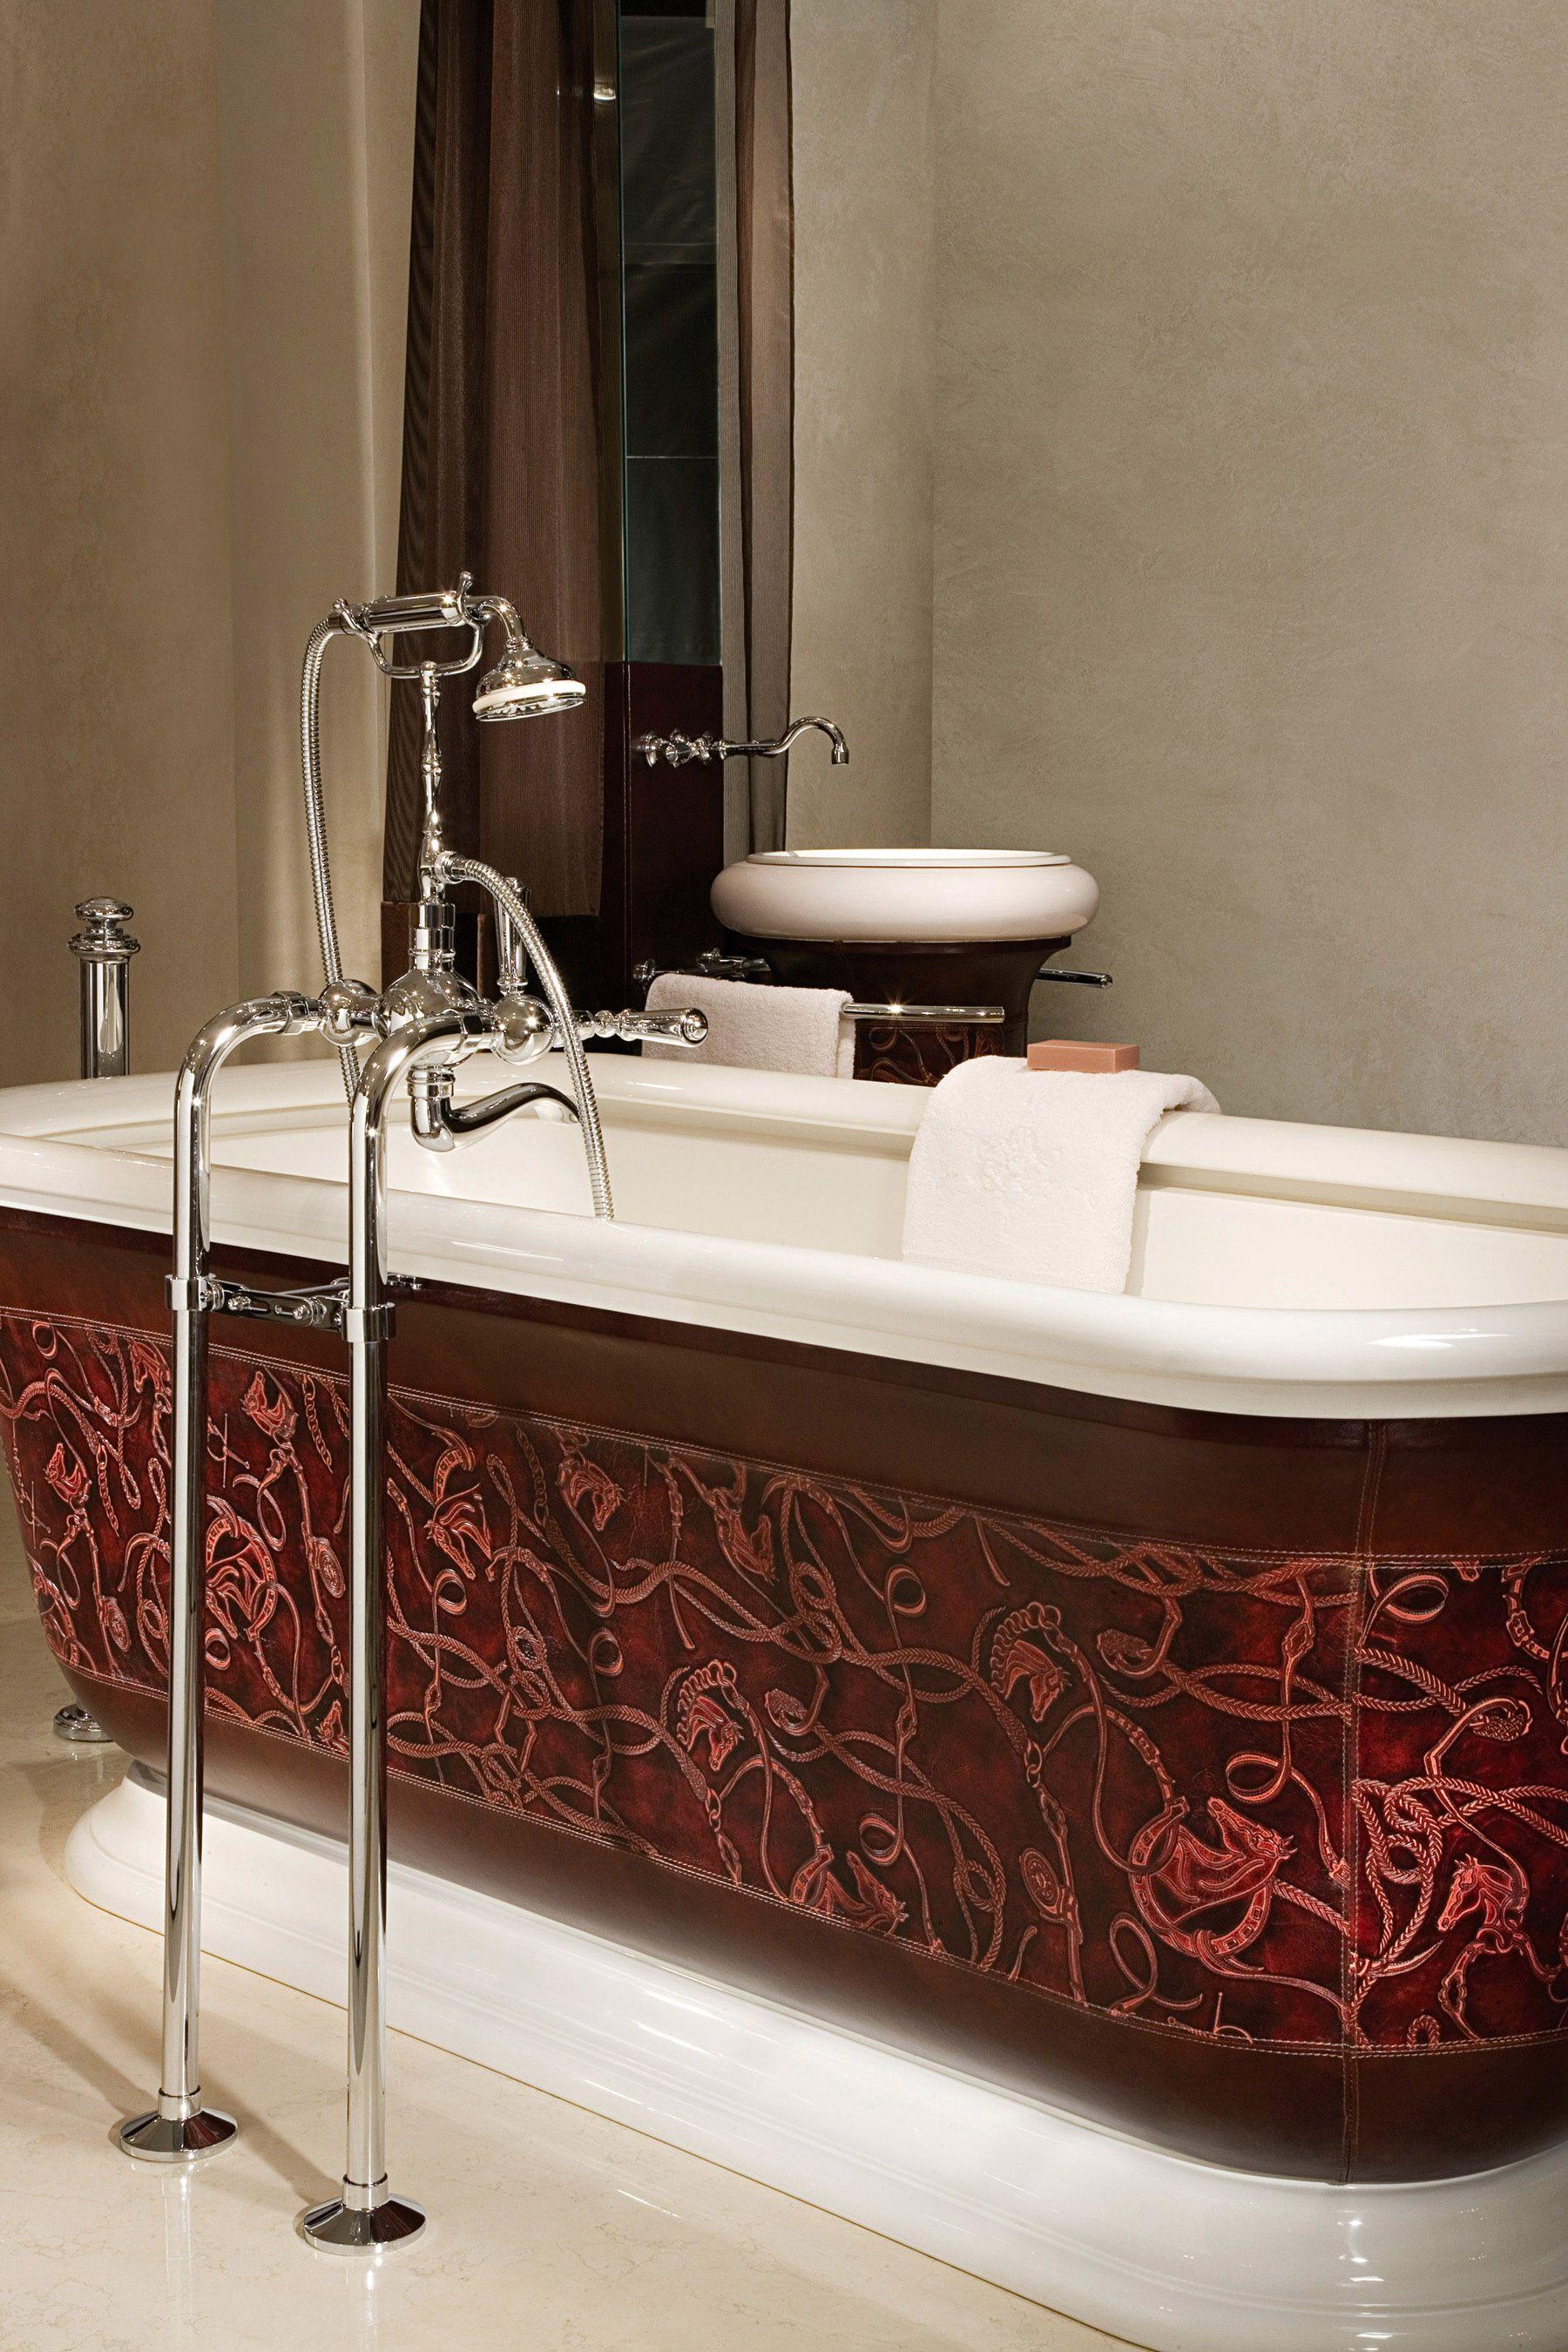 Home interior design accessories bathroom accessories by thg  homeinterior design  pinterest